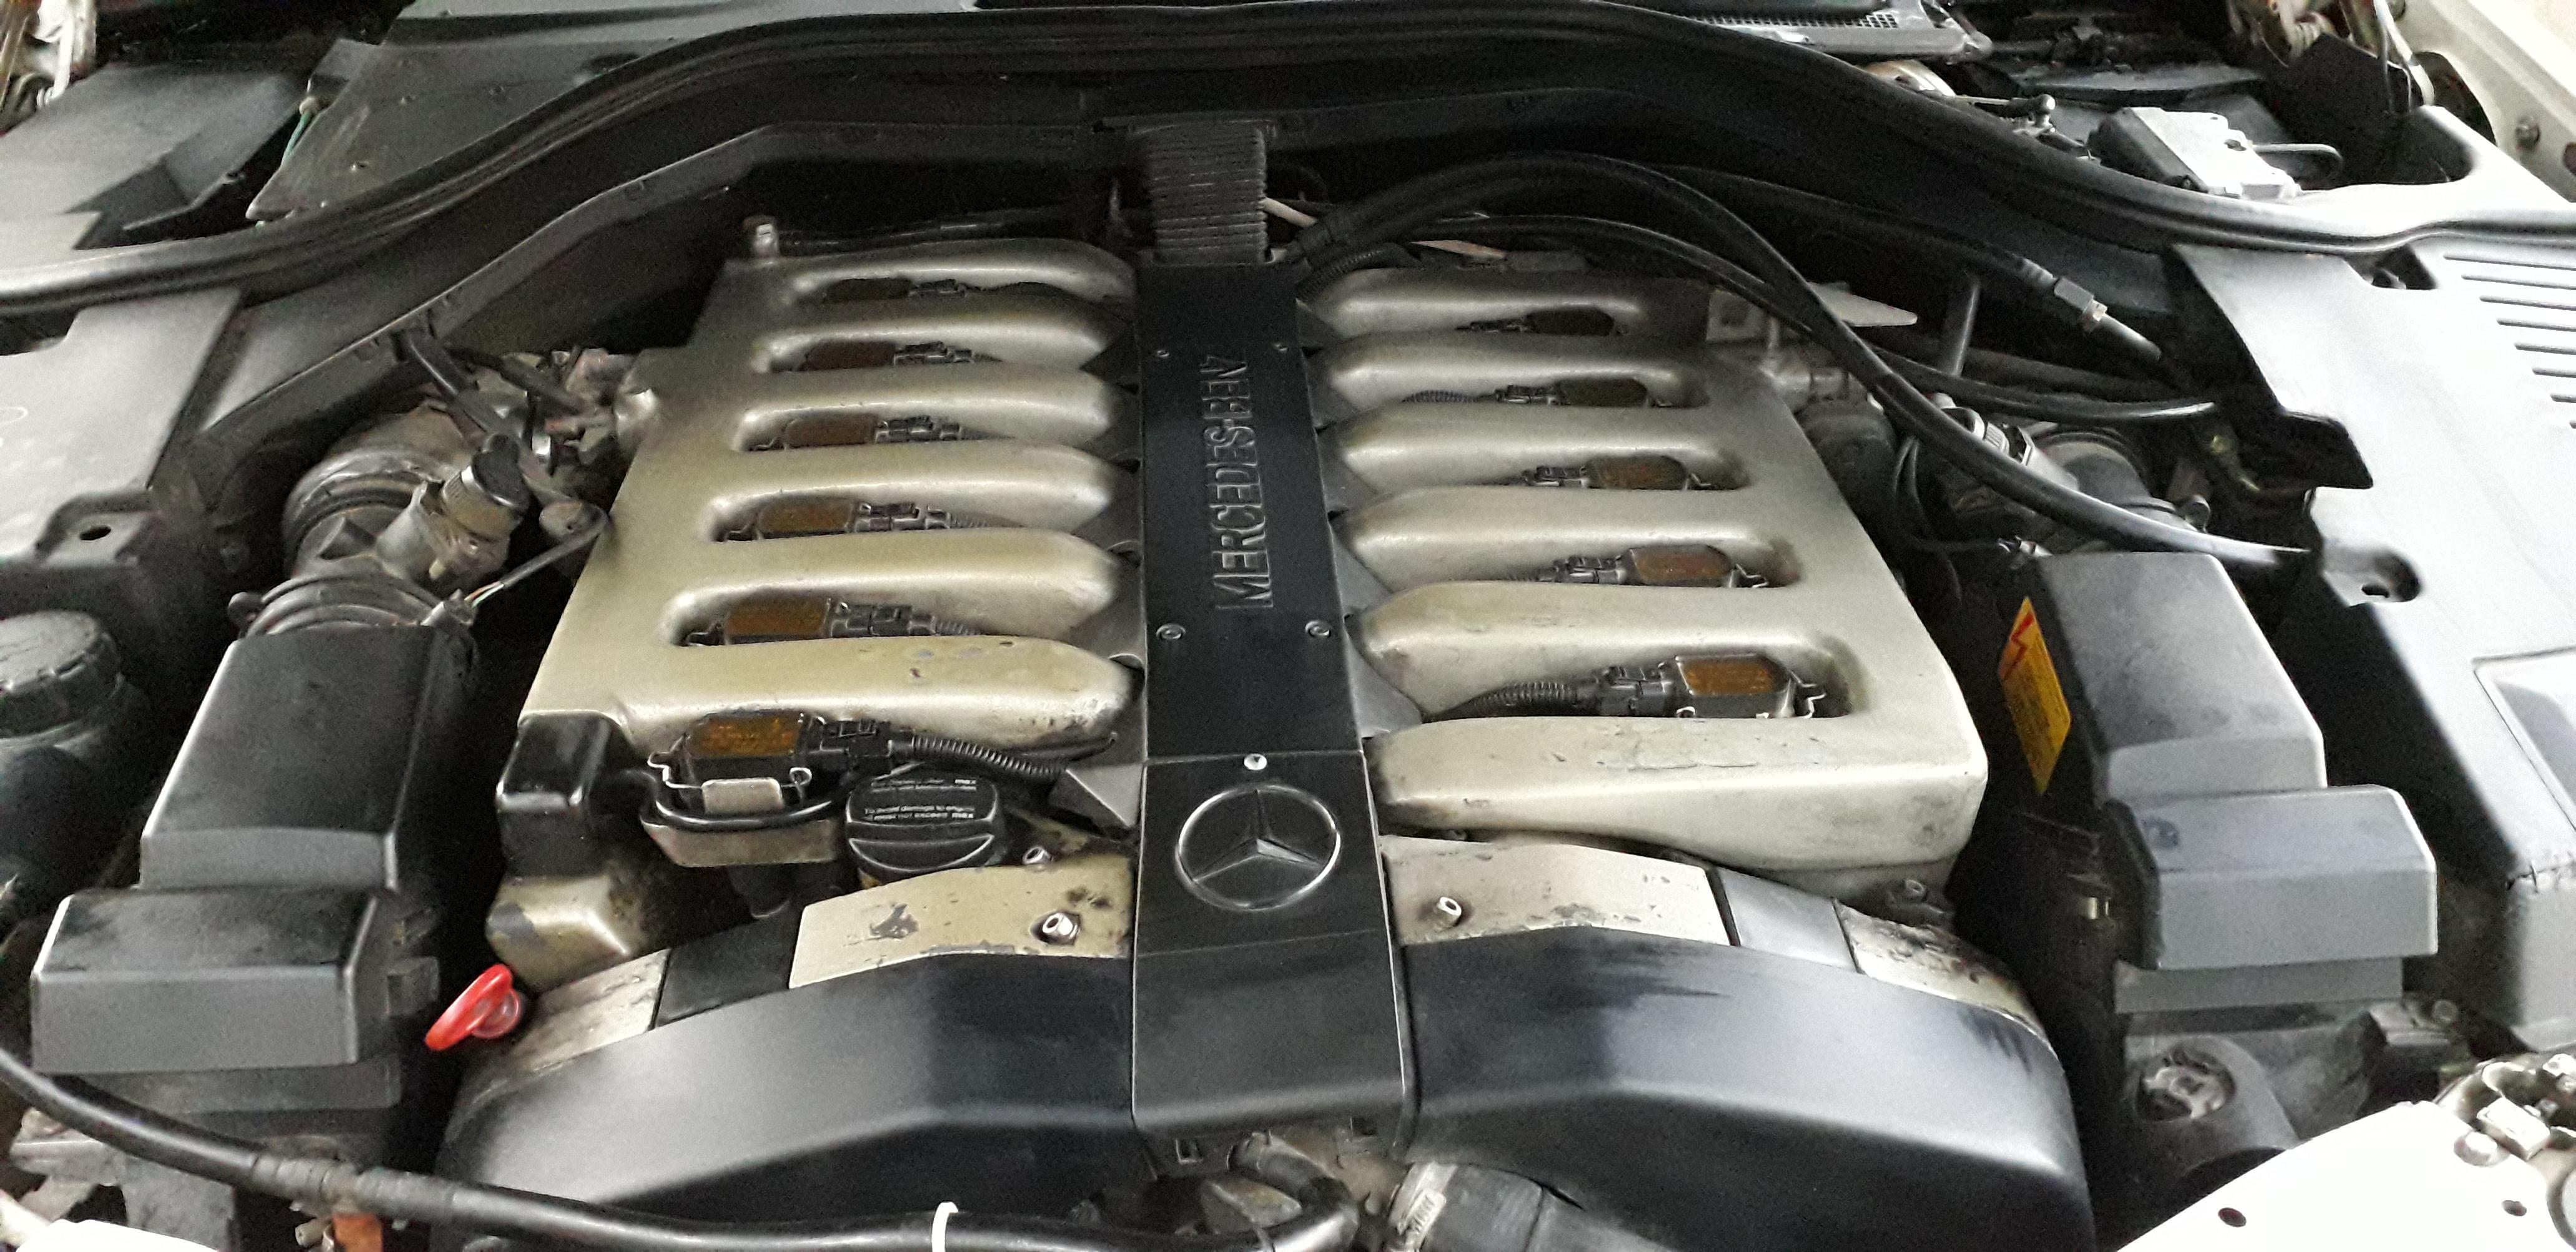 Mercedes-Benz 600 SEL 6.0(lt) 1996 Подержанный  $10500